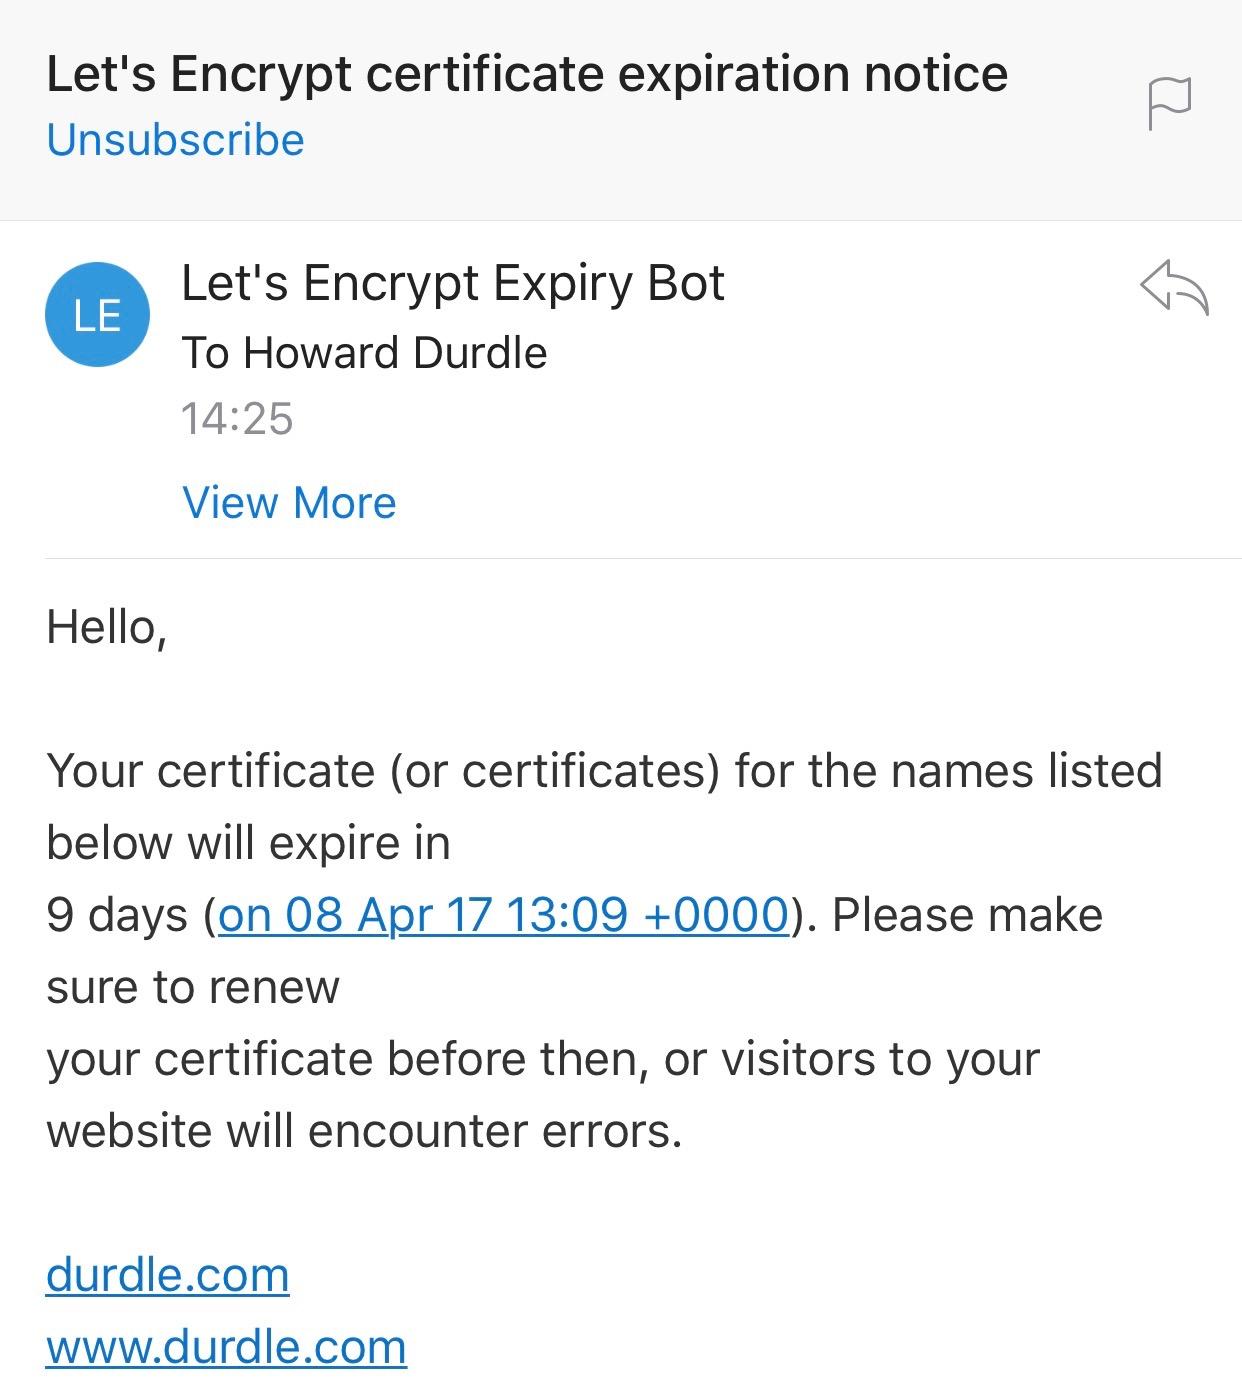 Let's Encrypt certificate expiration notice